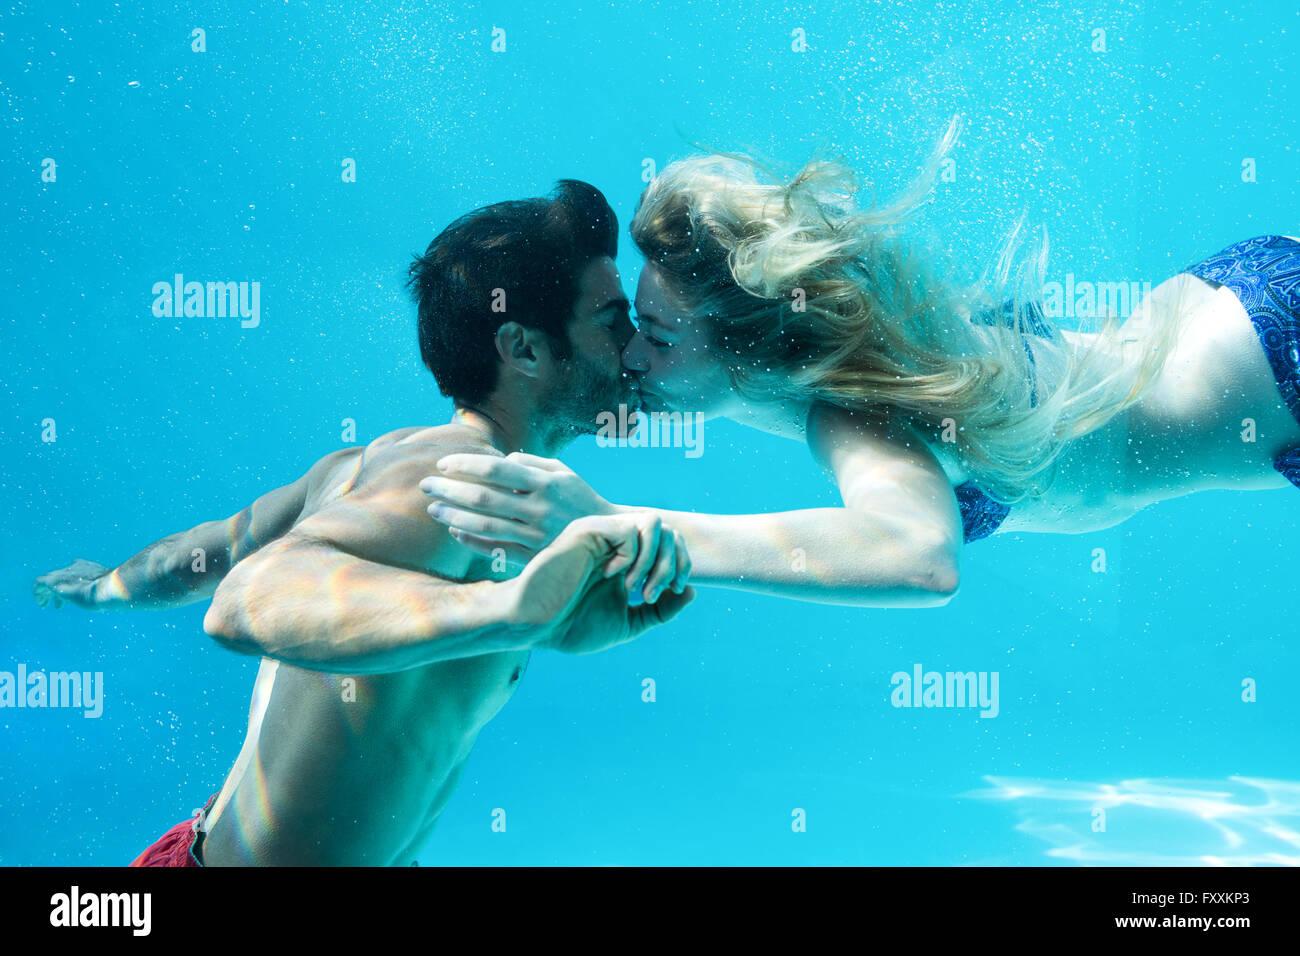 Coppia felice kissing underwater Immagini Stock